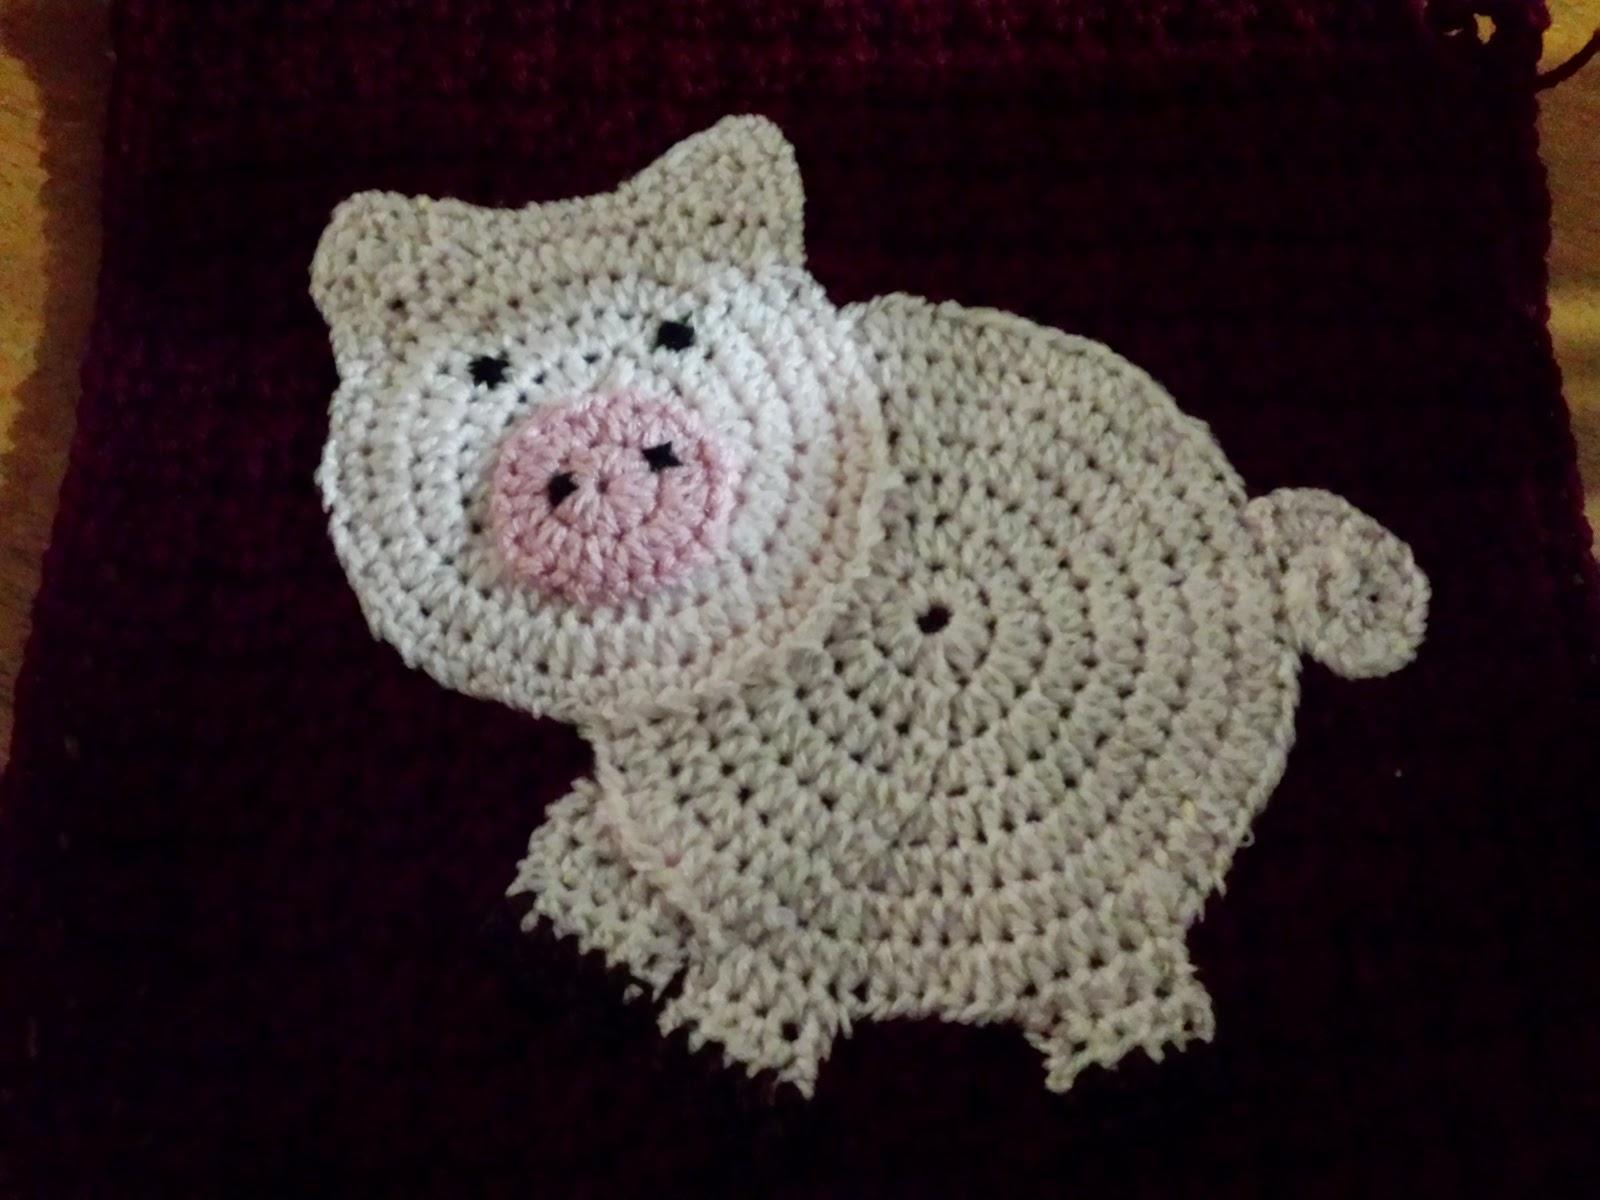 Blooming lovely wip crochet farm animals blanket pig applique